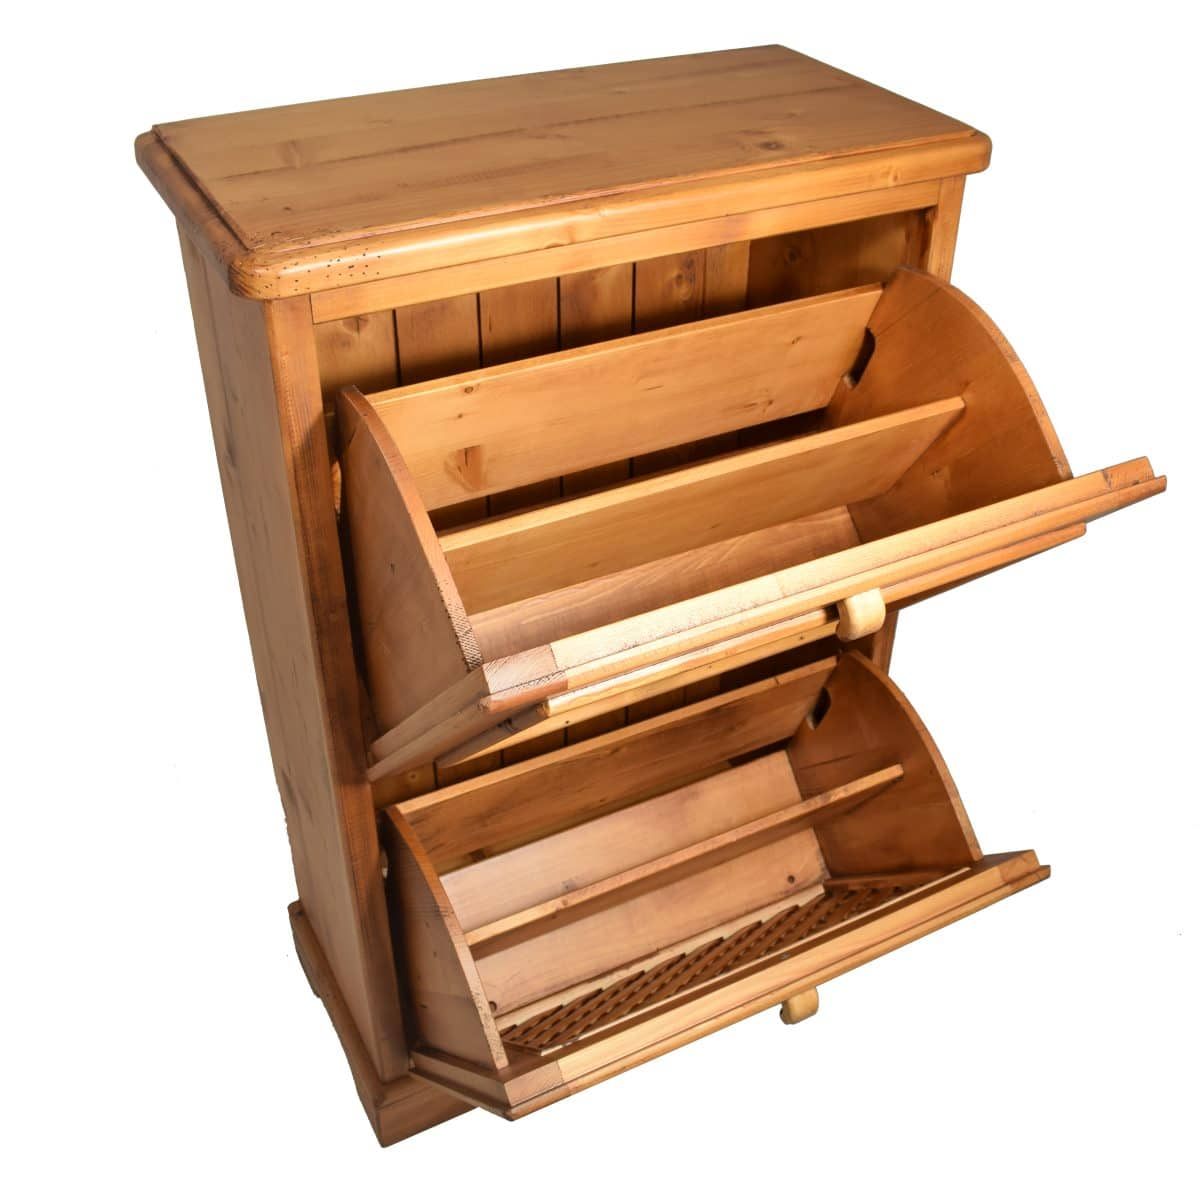 Zapatero R Stico De Madera Ecor Stico Venta De Muebles # Muebles De Madera Sostenible